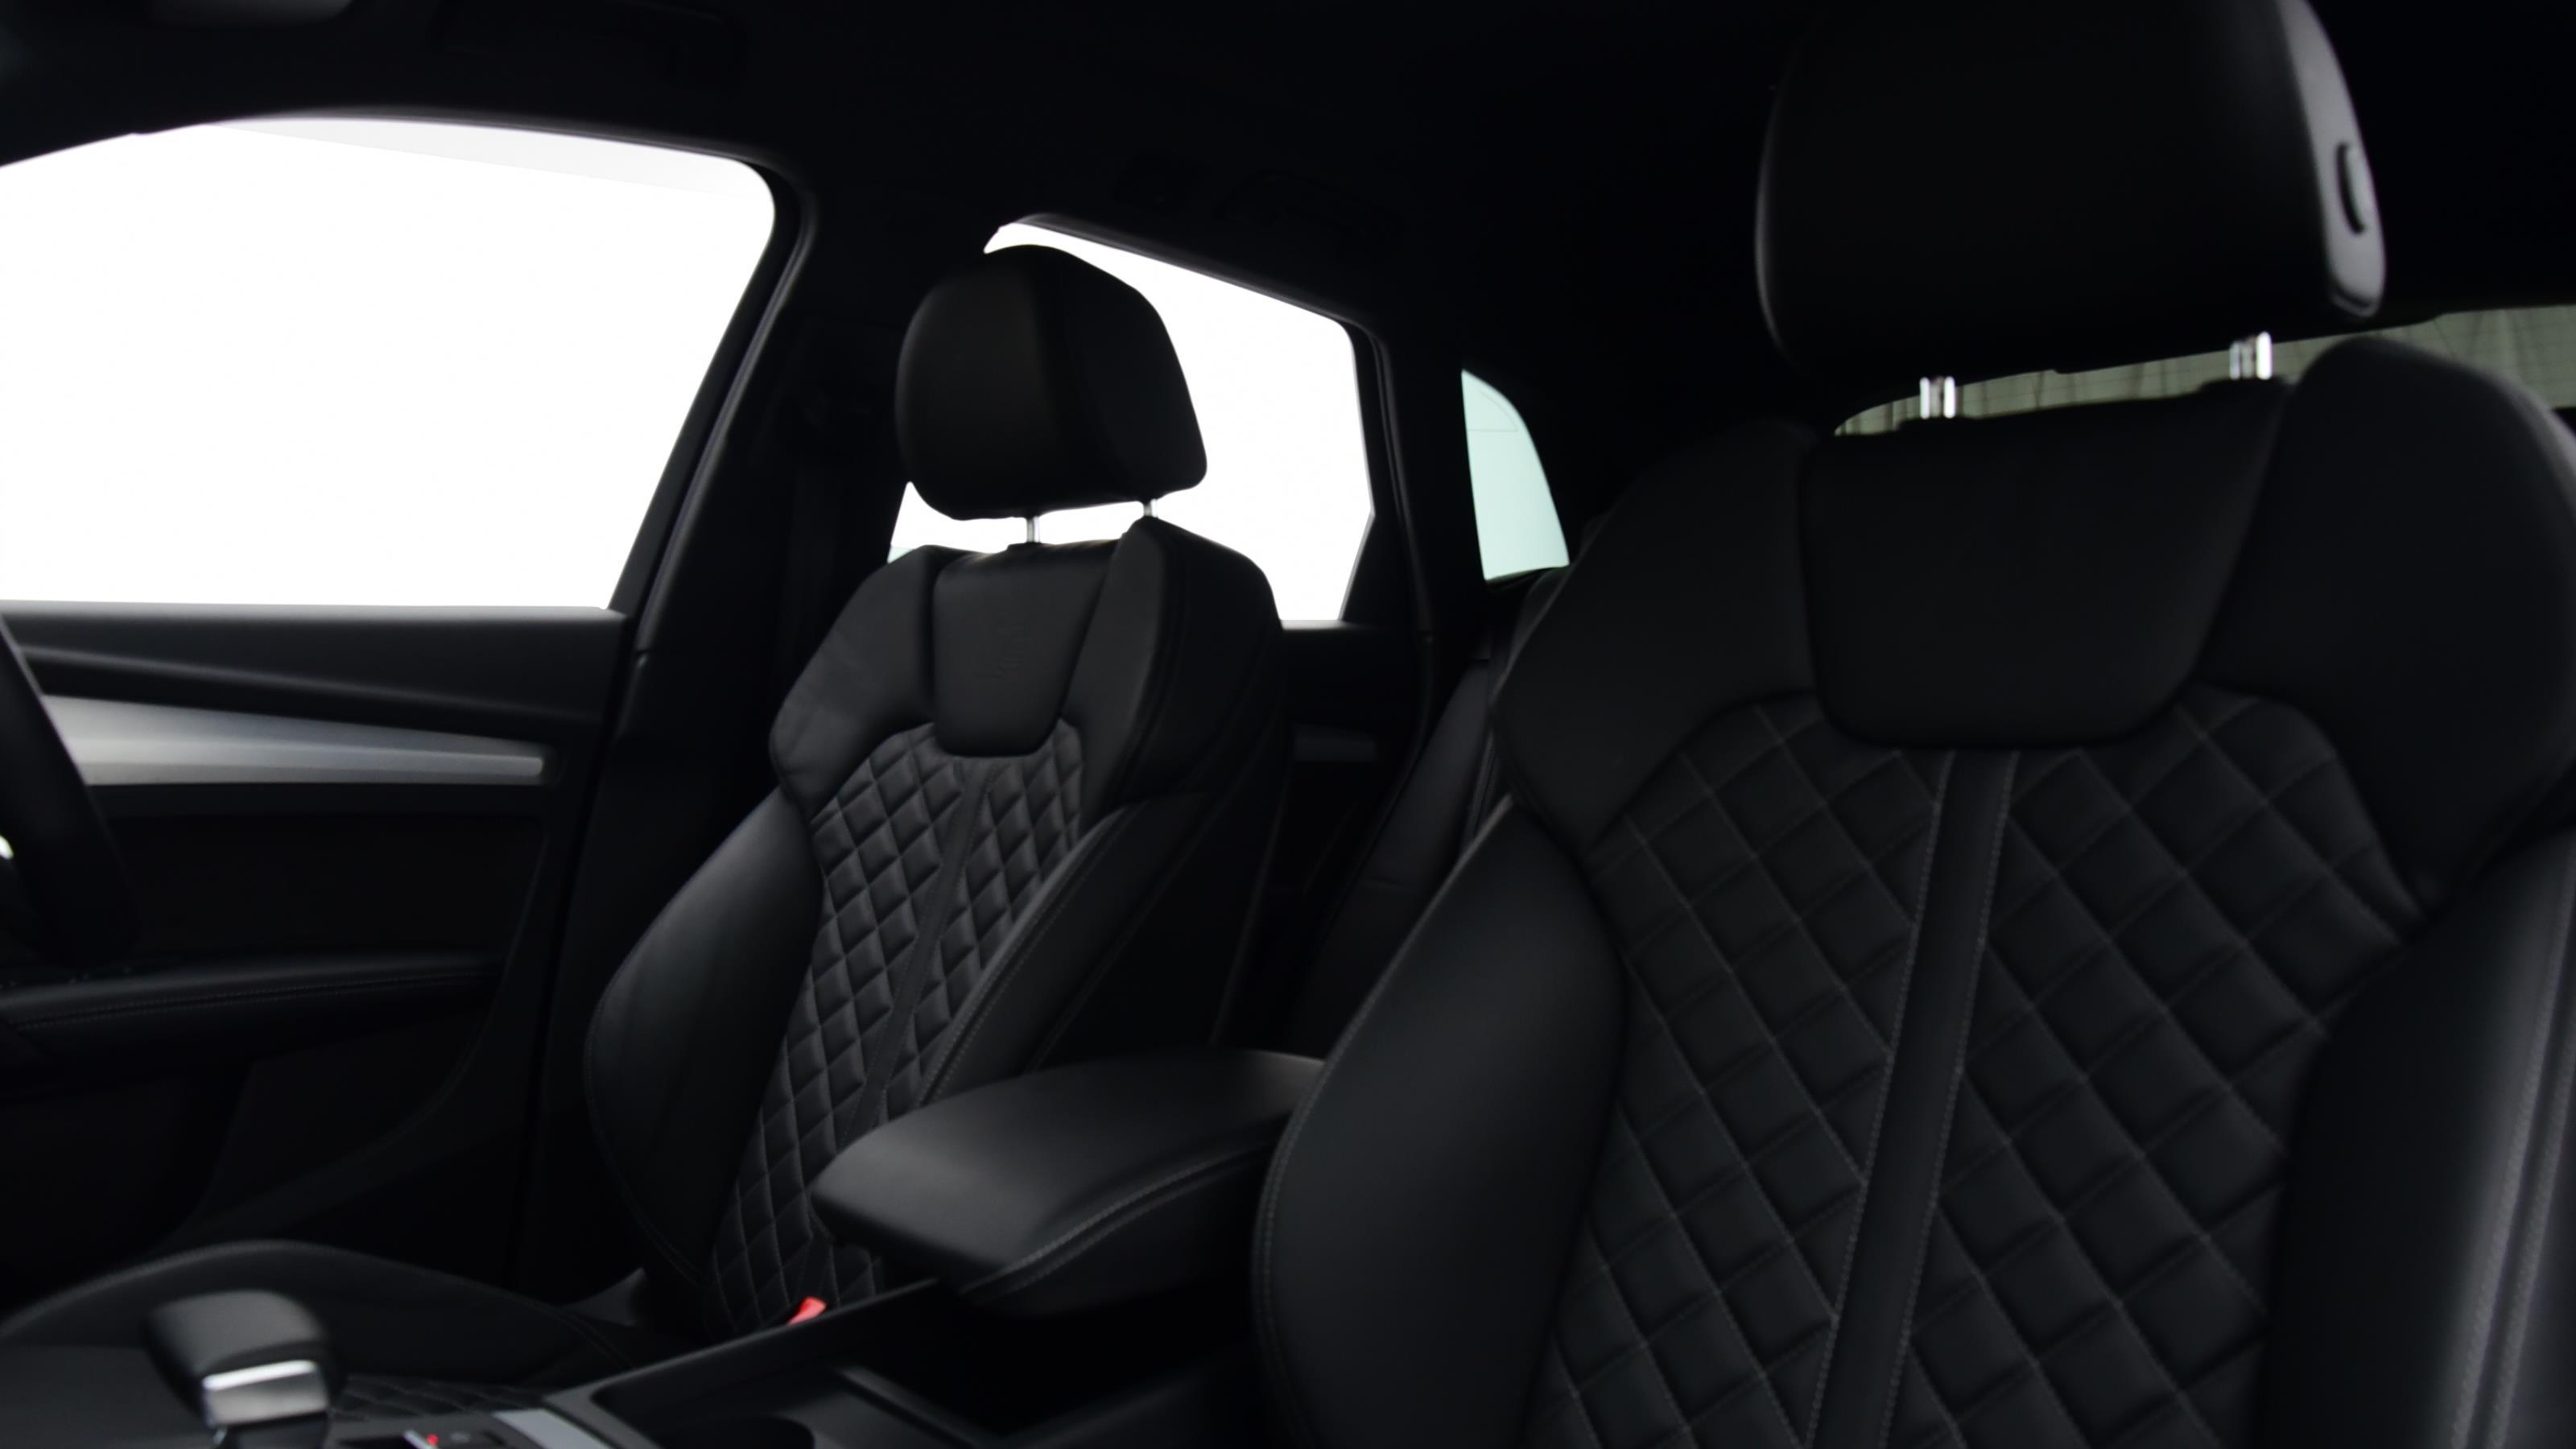 Used 2018 Audi Q5 SQ5 Quattro 5dr Tip Auto WHITE at Saxton4x4